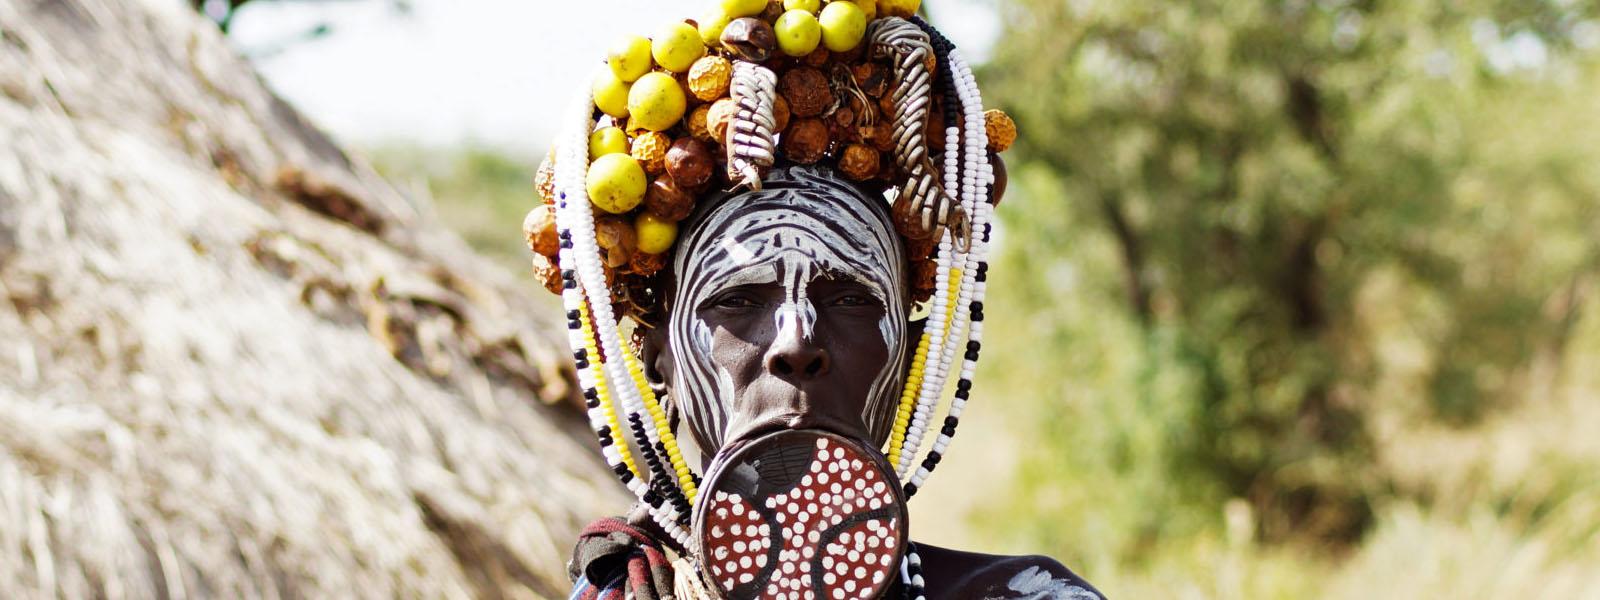 Mursi People Tribe Omo Valley Ethiopia – Lip Plate People 2